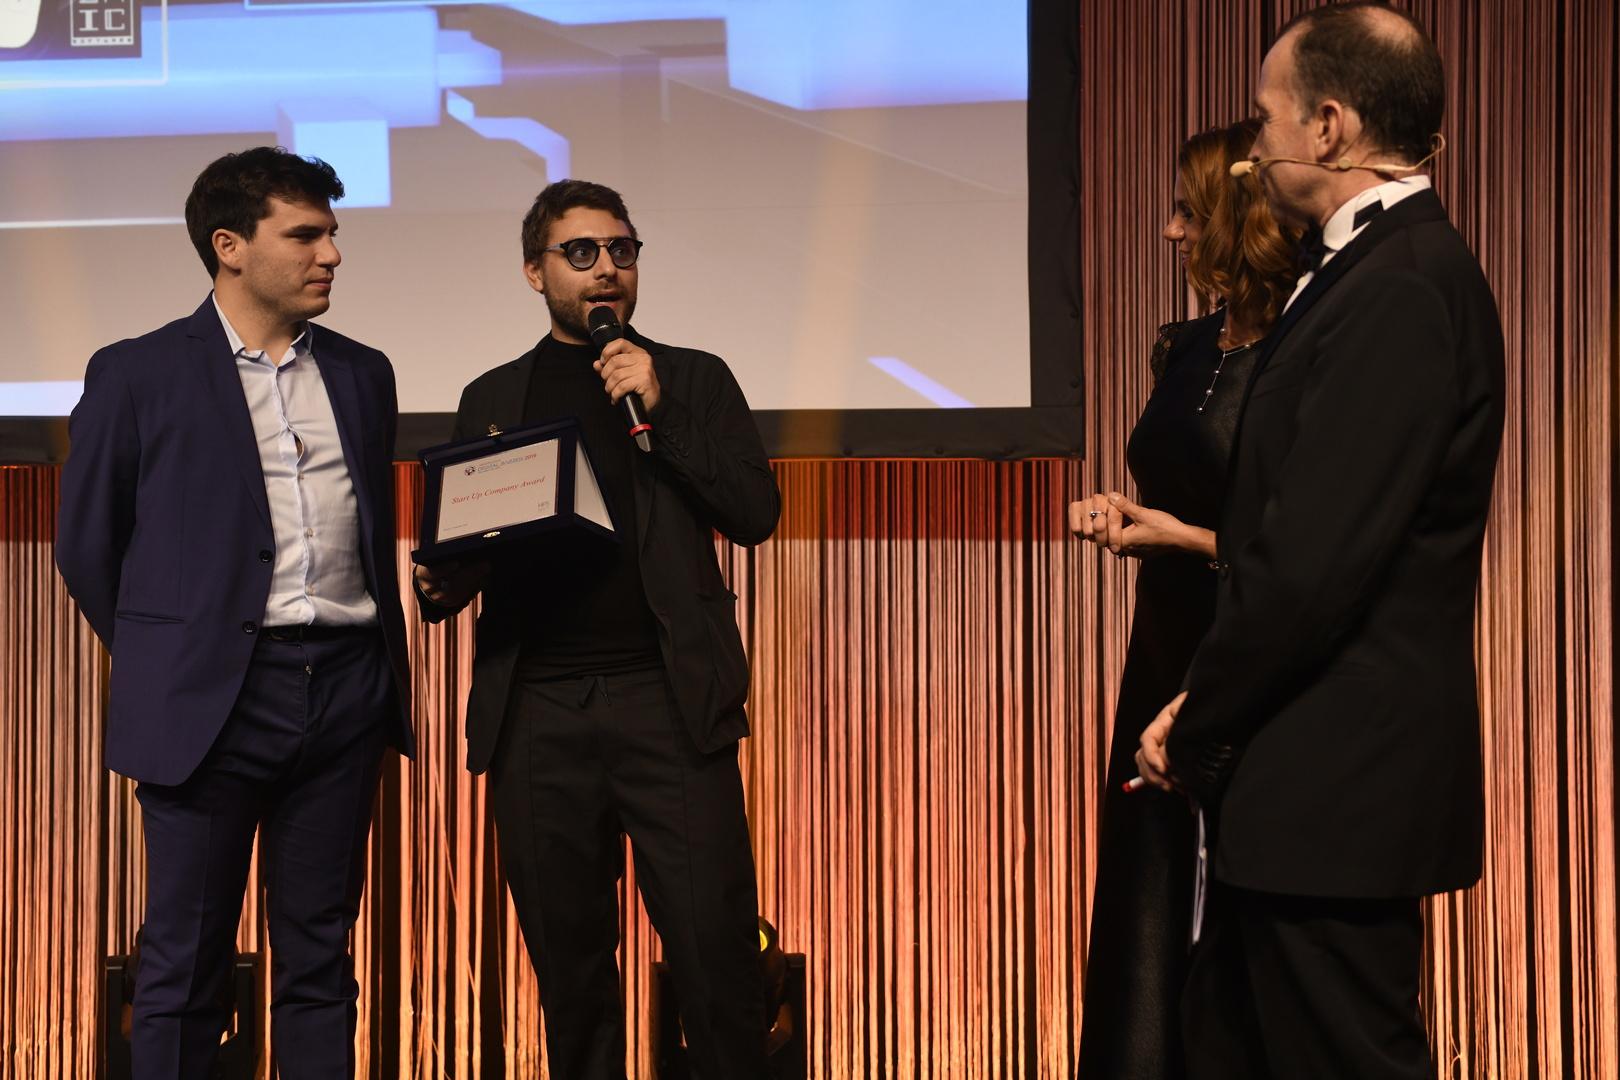 AboutPharma Digital Awards